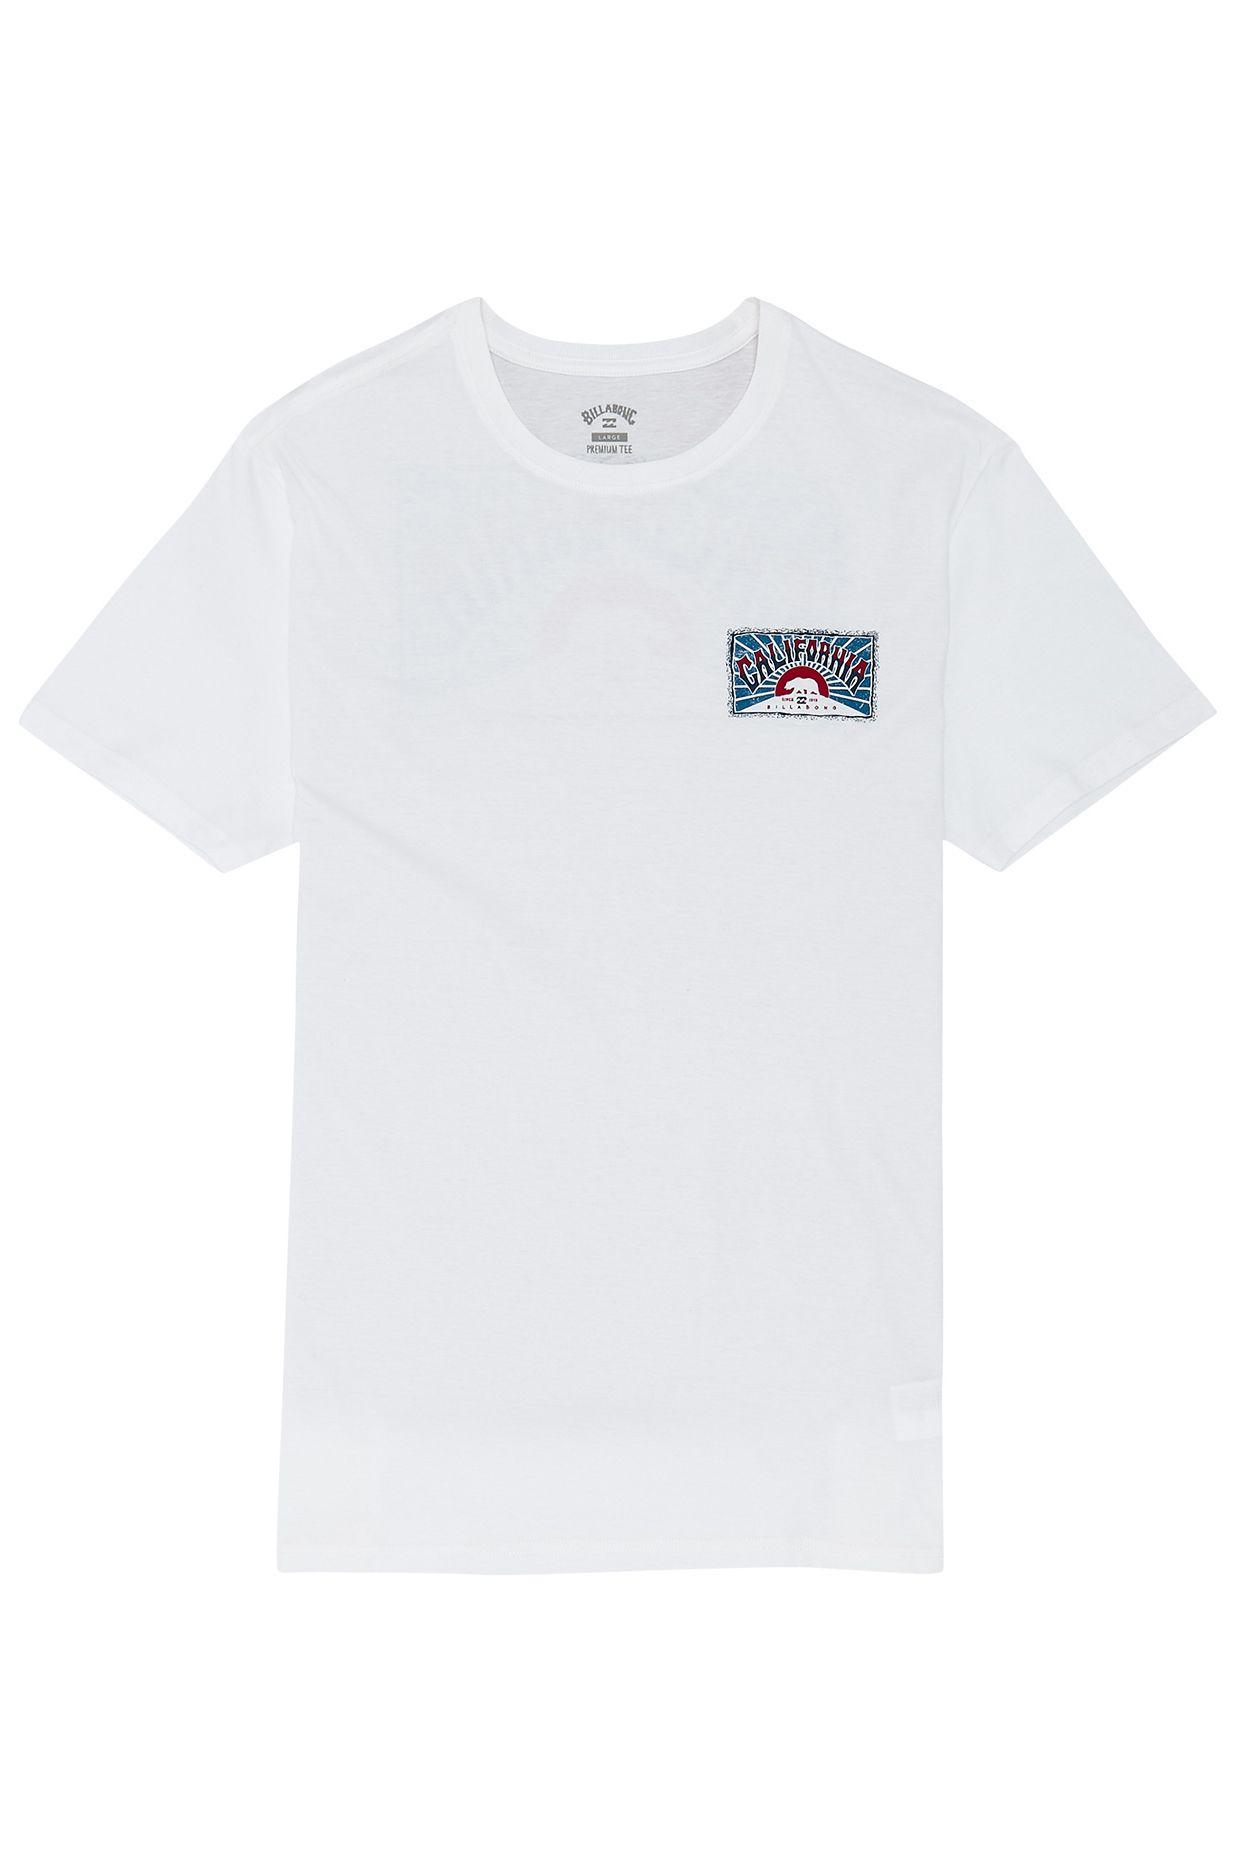 T-Shirt Billabong DREAMY PLACE White/Blue